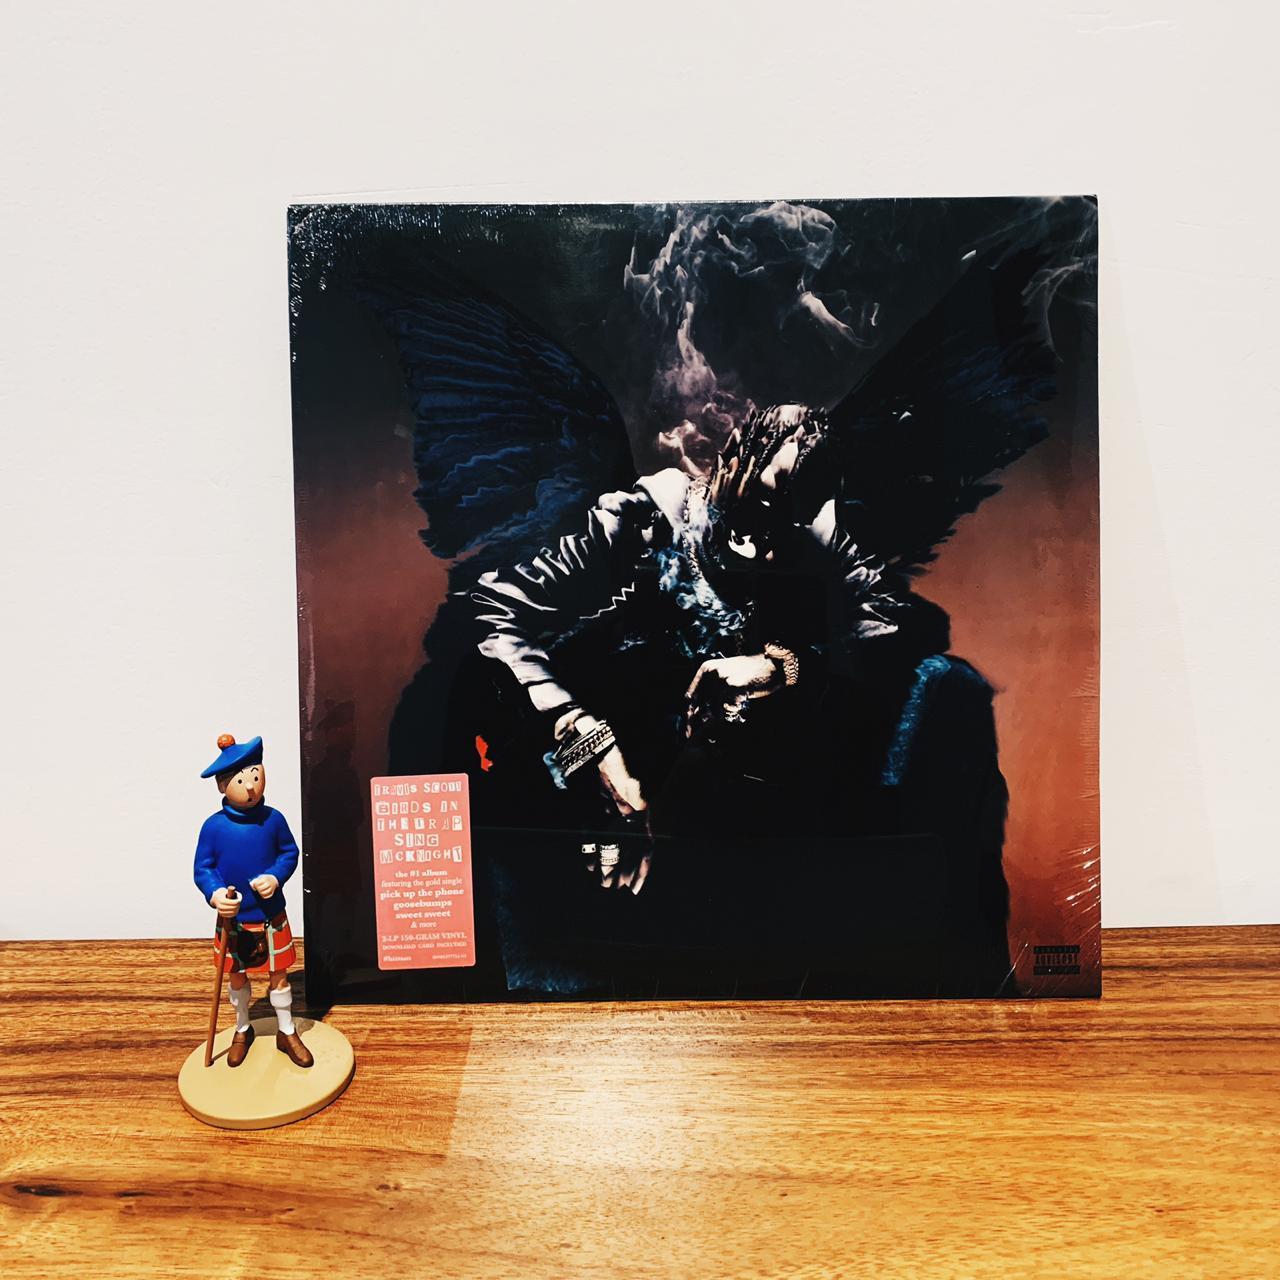 Piringan Hitam/vinyl/lp Travis Scott - Birds In The Trap Sing Mcknight By Playlist Record Store